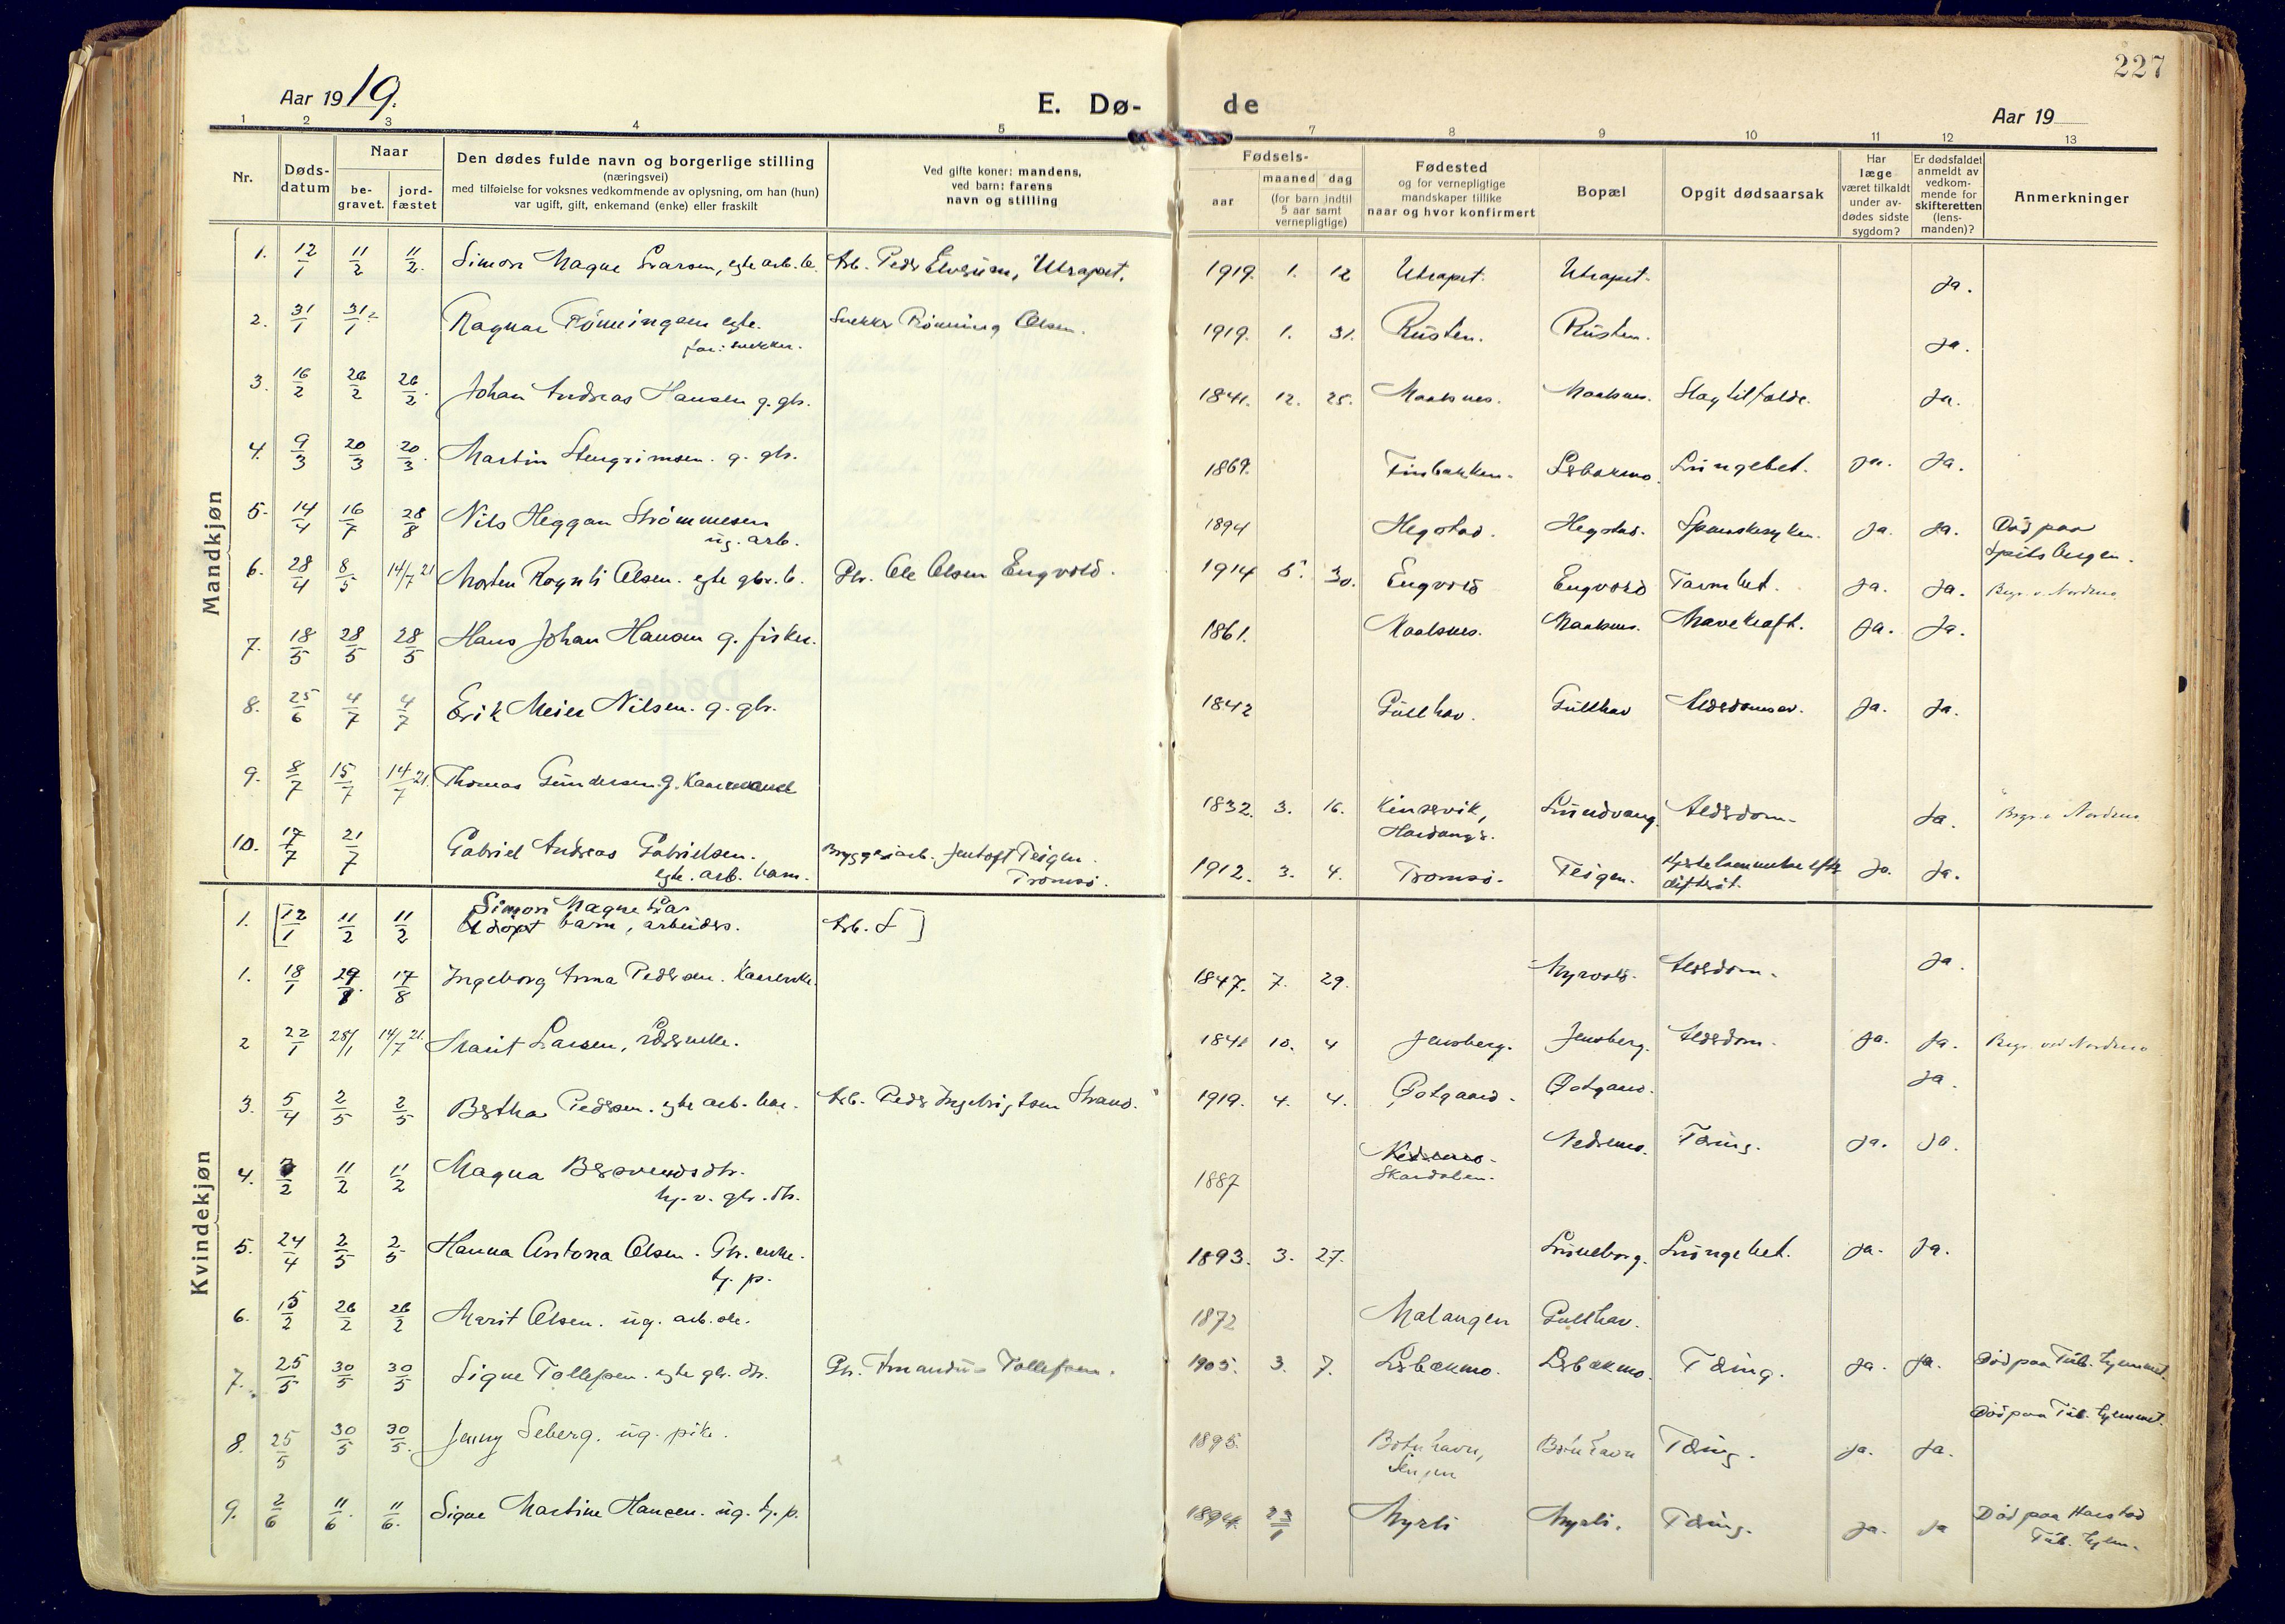 SATØ, Målselv sokneprestembete, Ministerialbok nr. 14, 1919-1932, s. 227